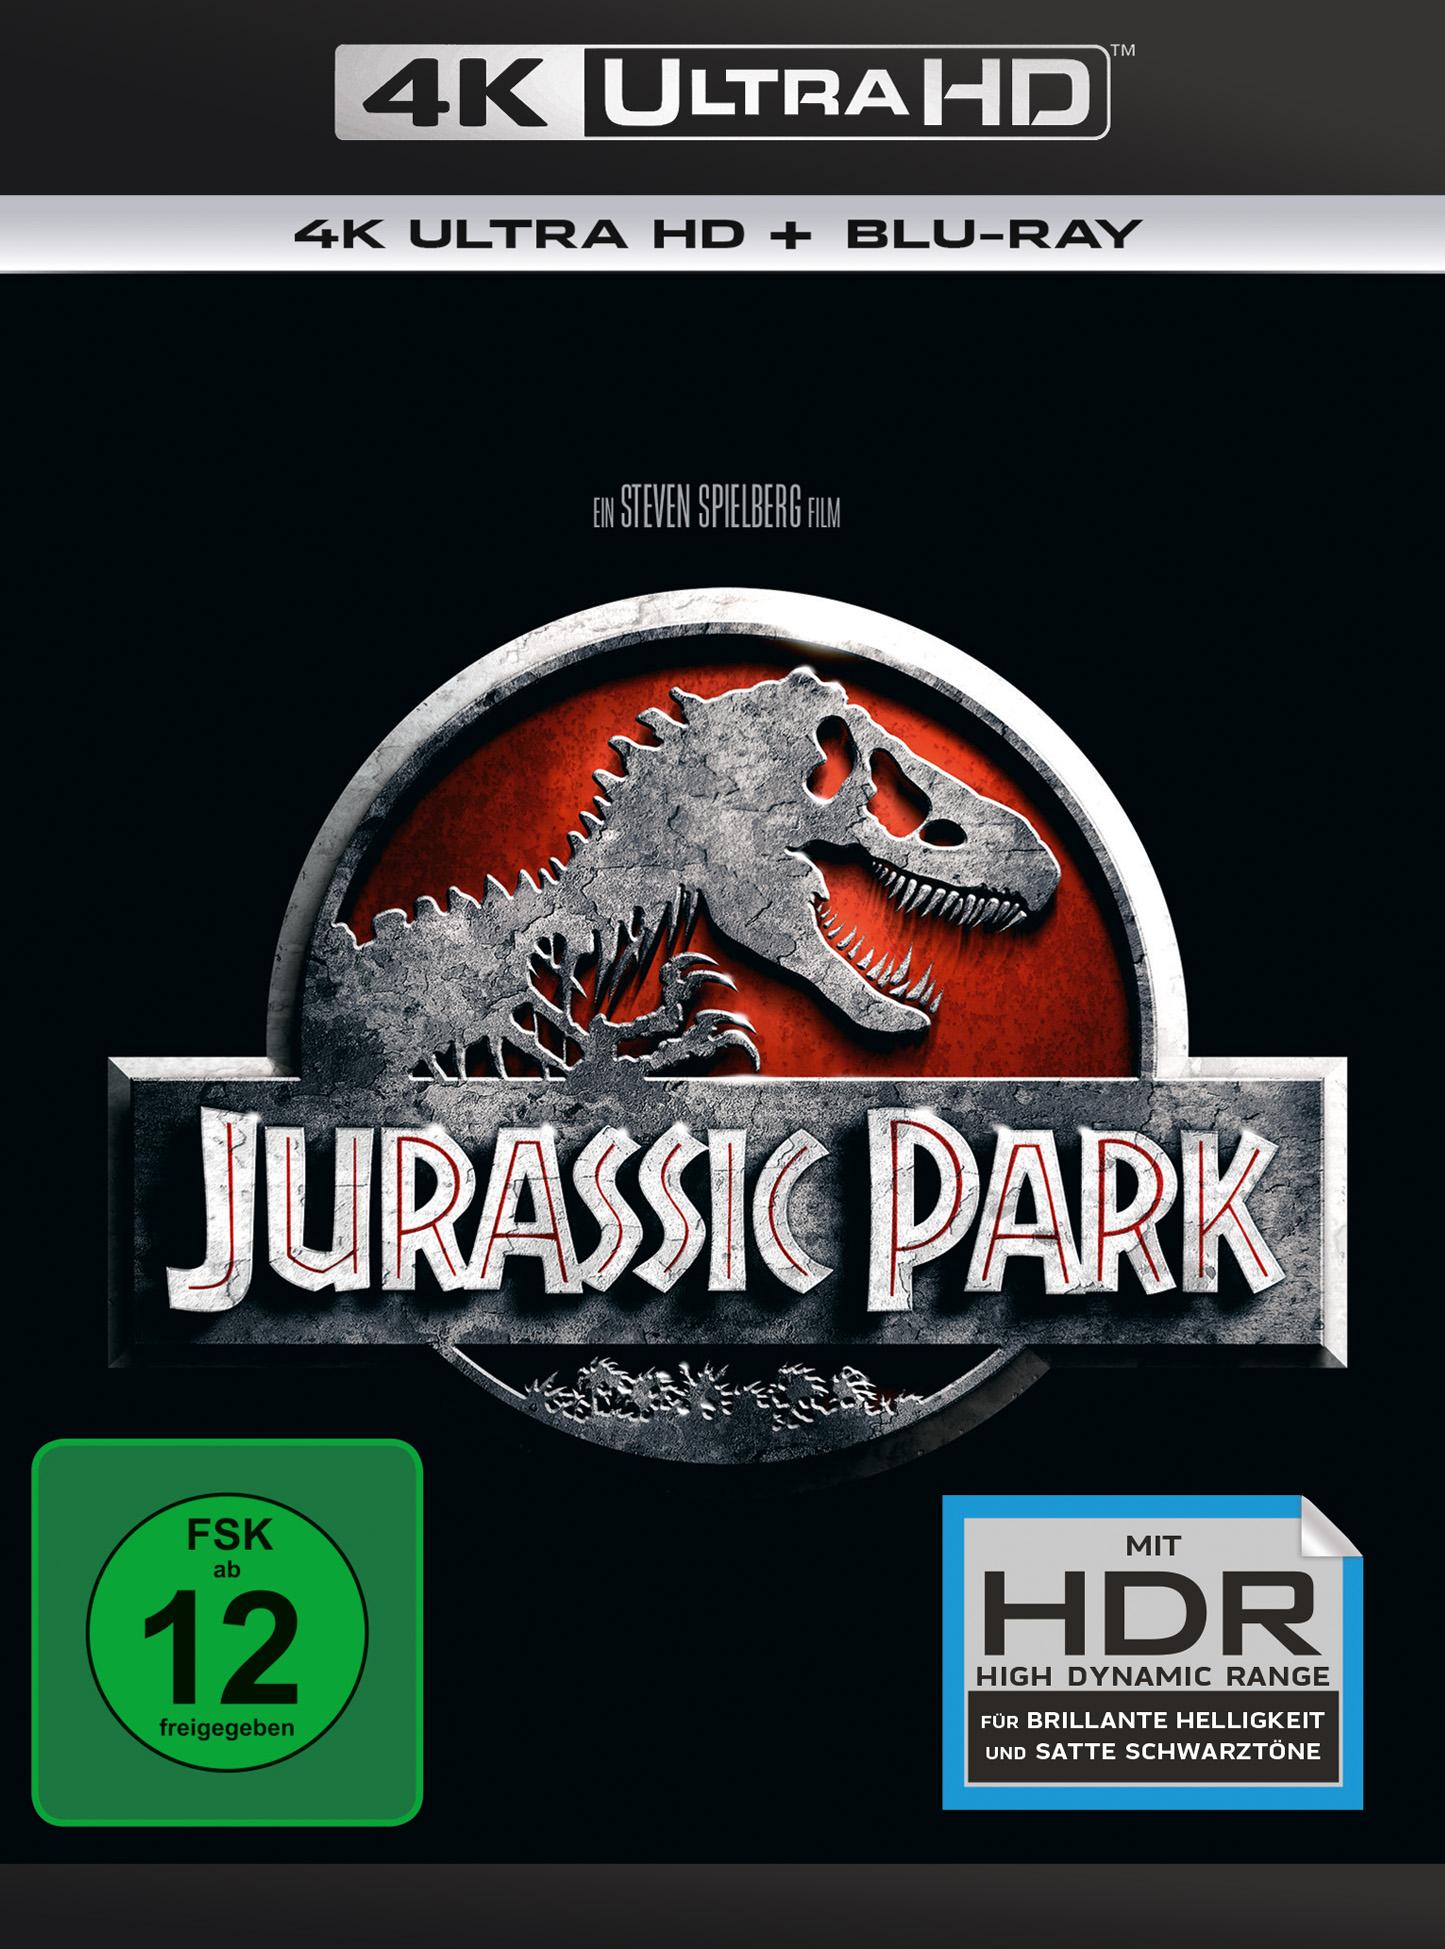 Jurassic Park (1993) - Jurassic Park (1993) - User Reviews ...